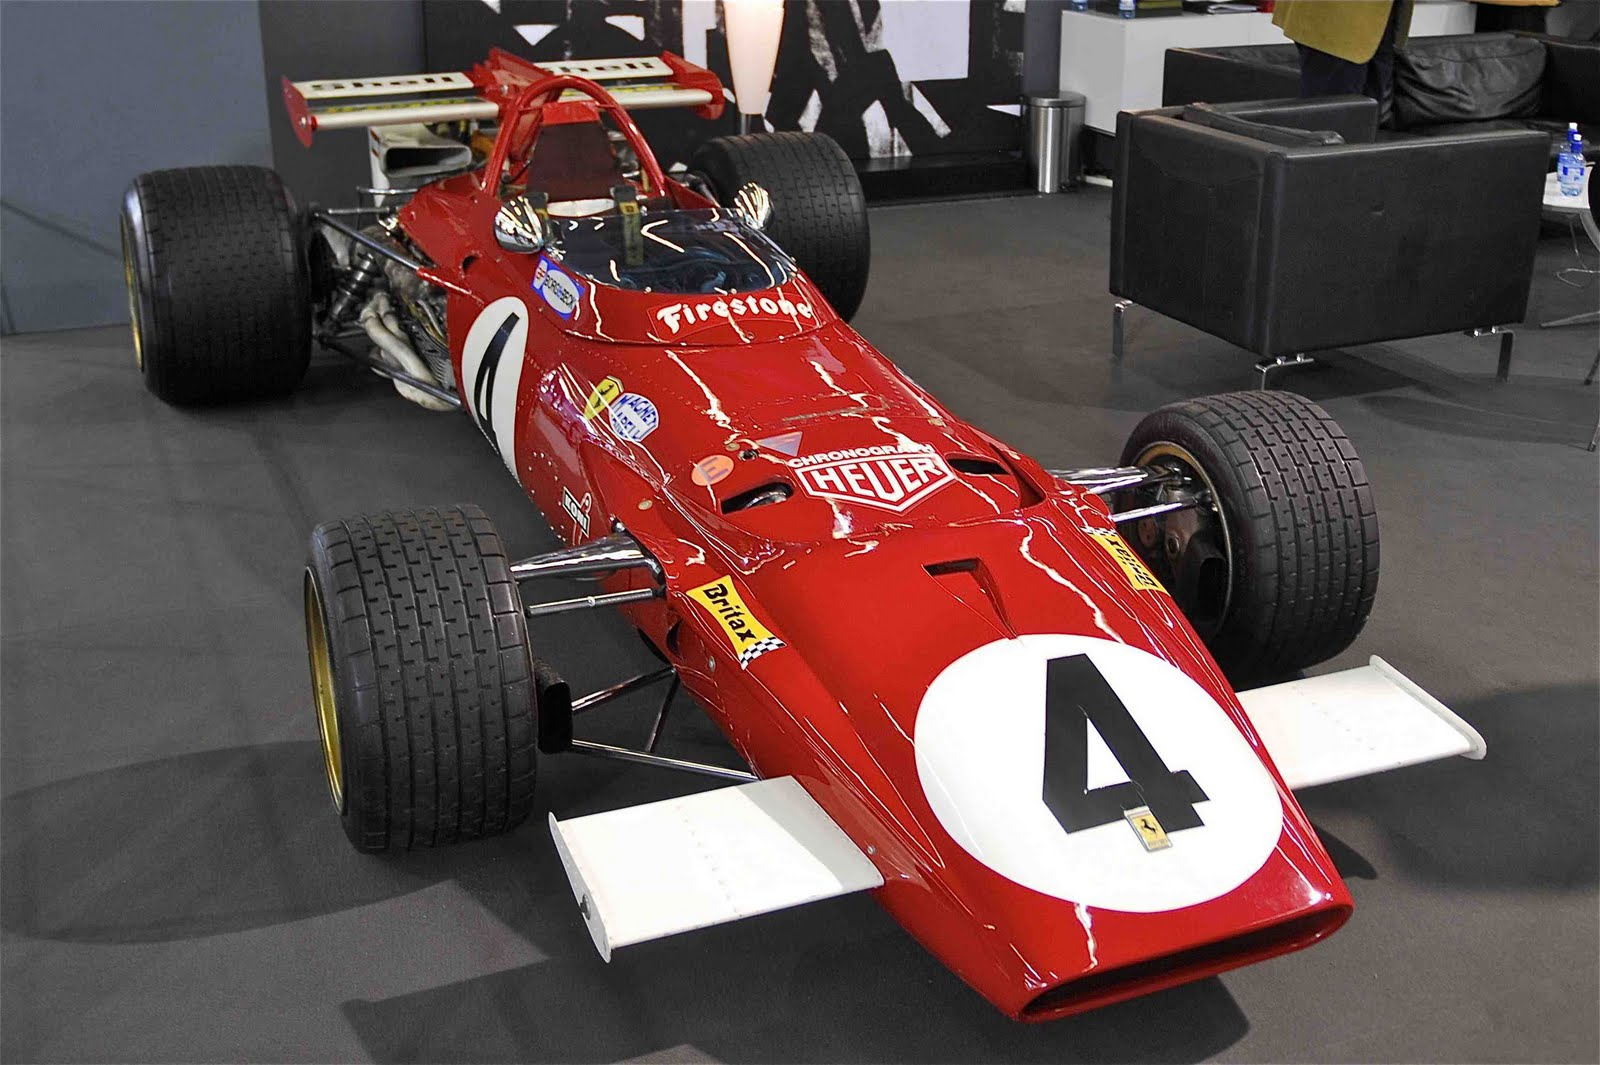 http://3.bp.blogspot.com/_0vQee8oZXq8/S_48whUE0iI/AAAAAAAARBc/XJC9yborQAk/s1600/Ferrari+F1+1970.jpg